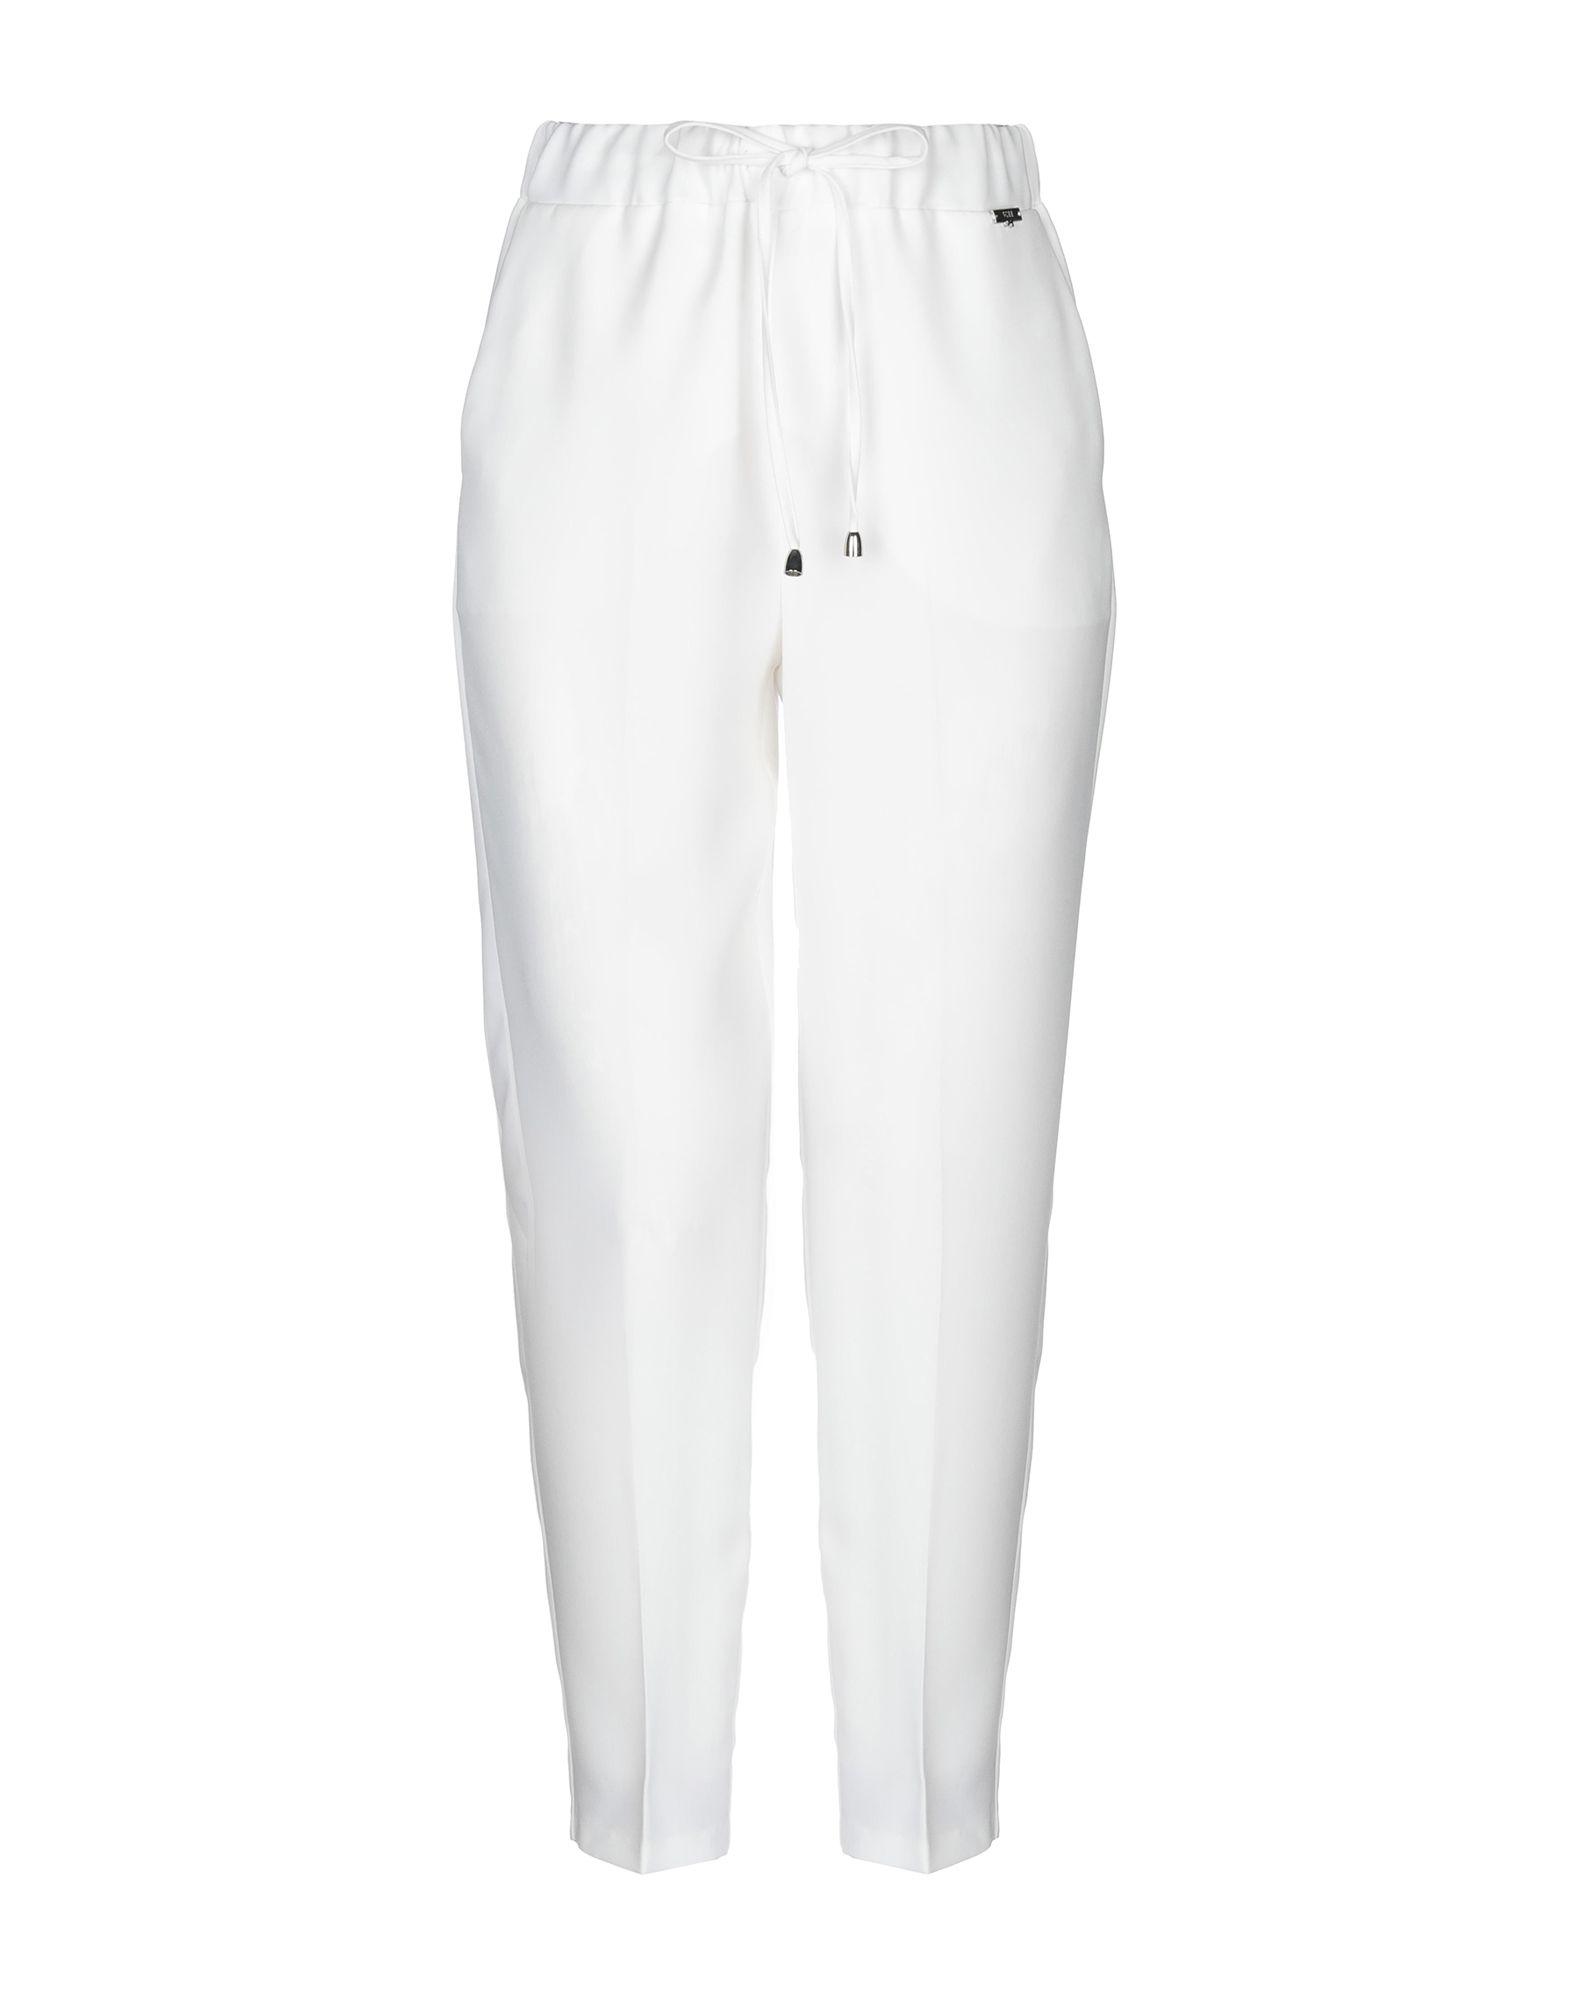 SCEE by TWINSET Повседневные брюки scee by twinset джинсовые брюки